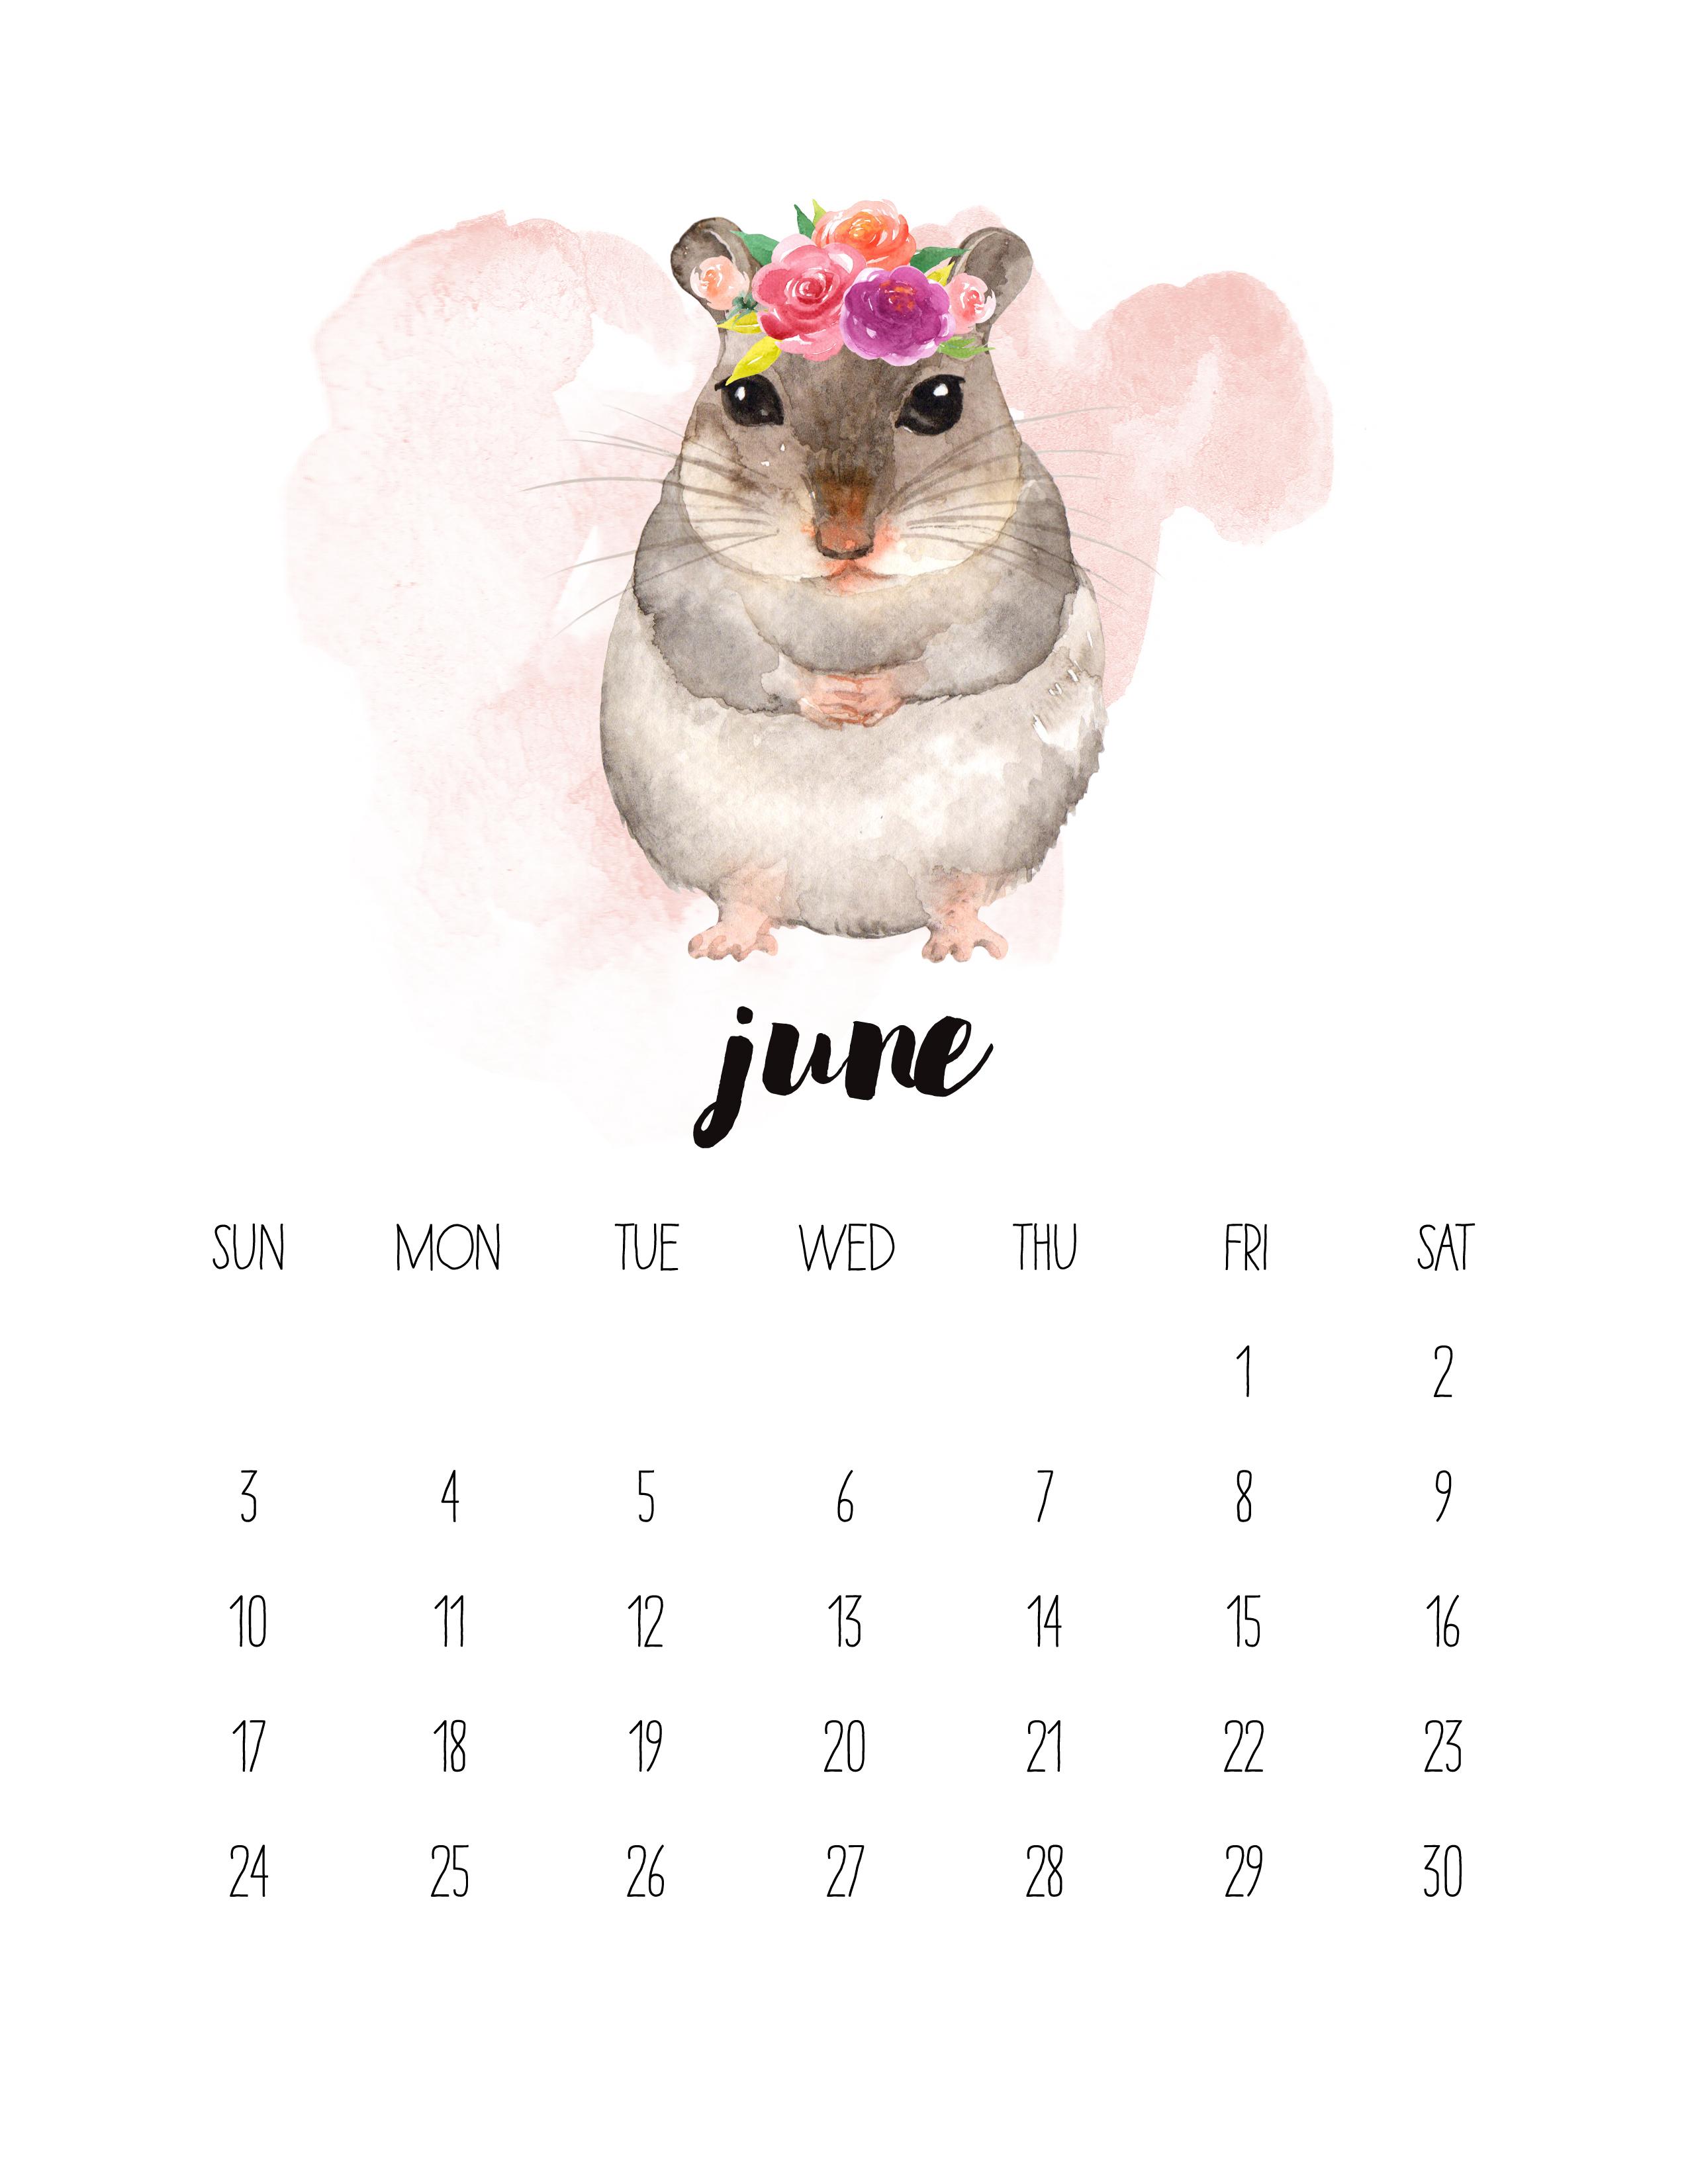 Free Printable 2018 Watercolor Animal Calendar - The Cottage Market